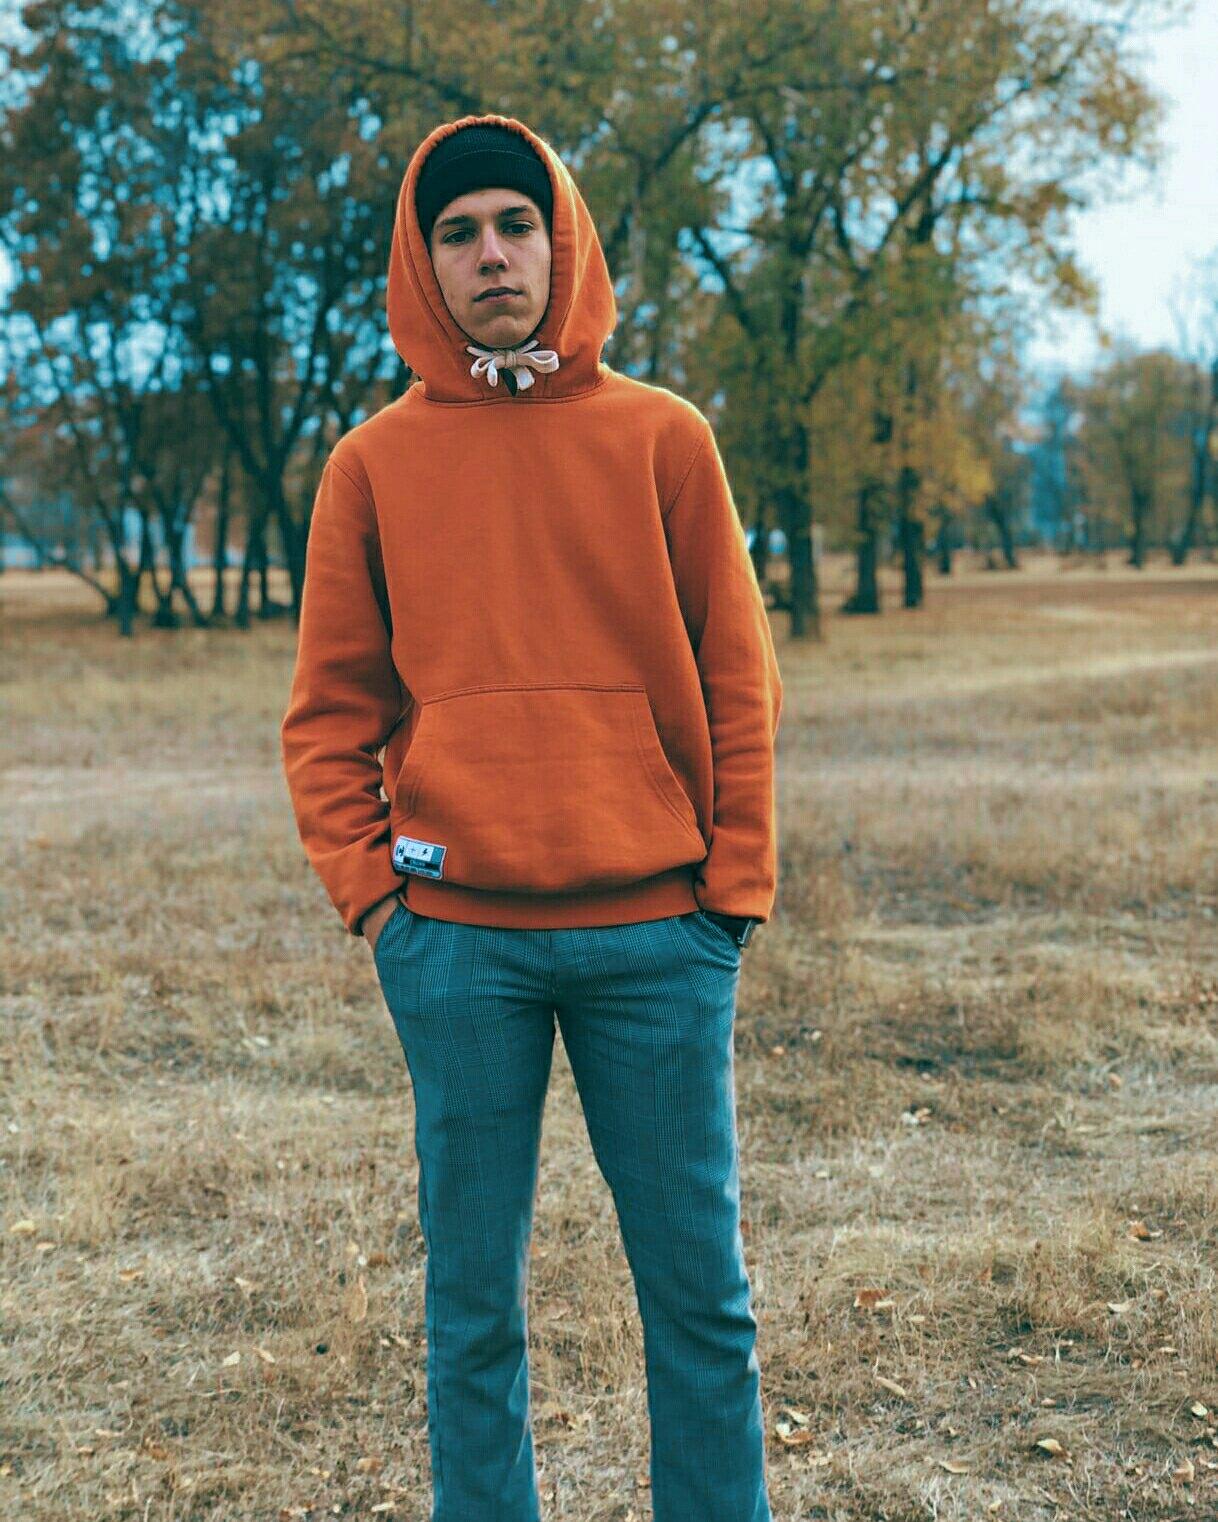 Георгий, 18, Engel's